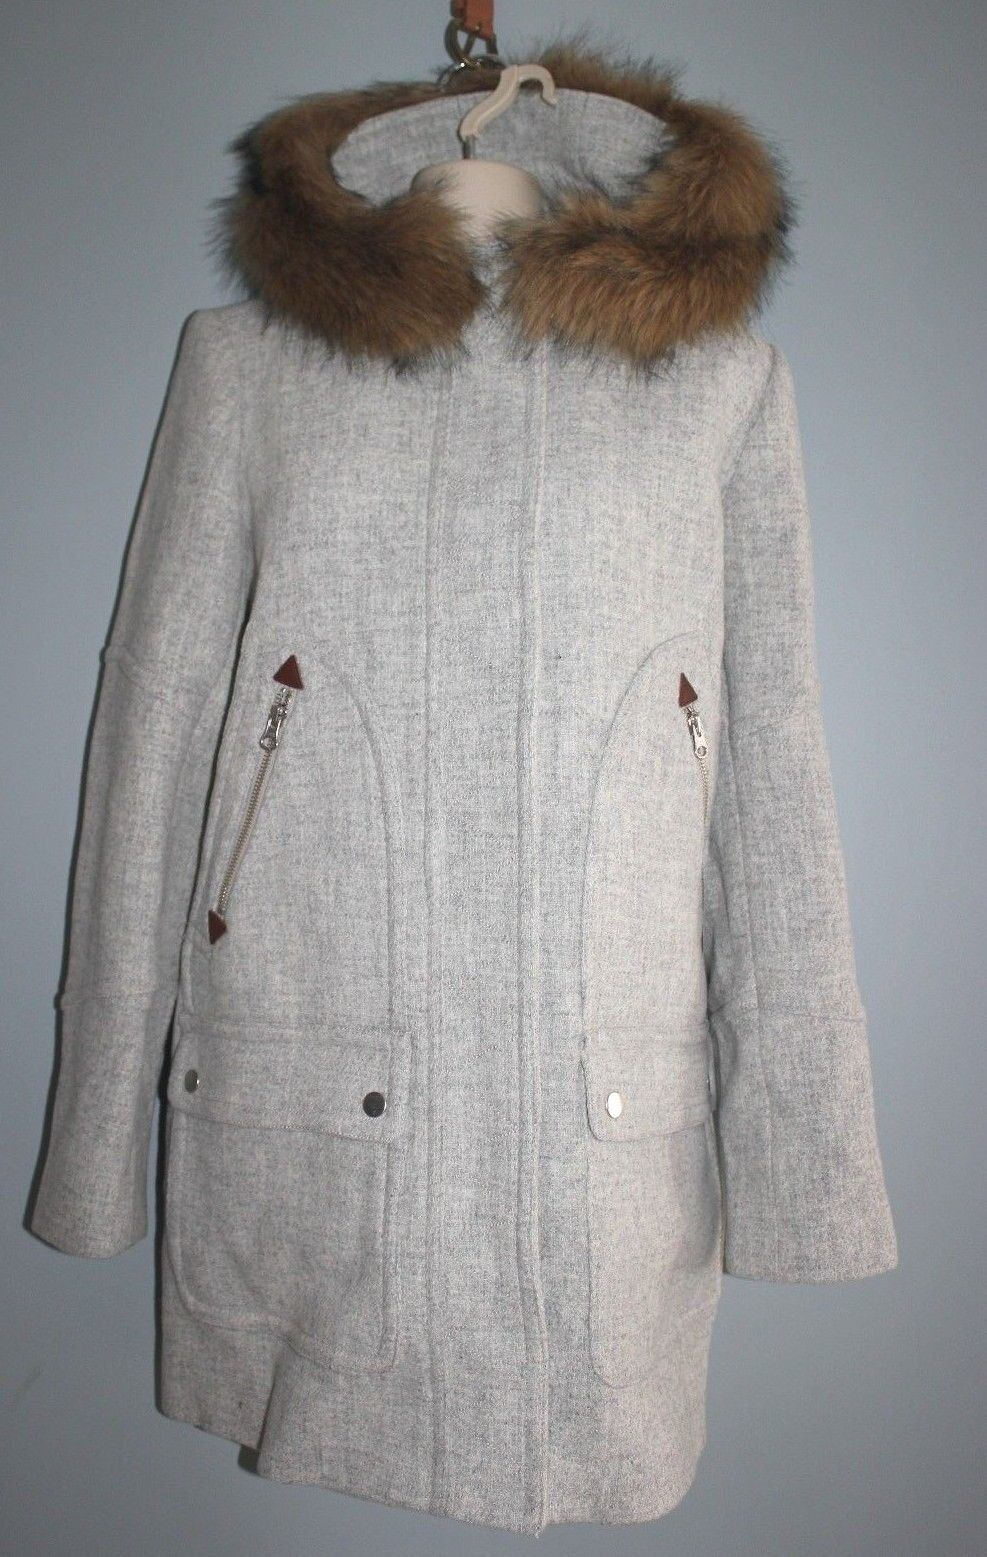 JCrew Petite Chateau Parka Italian Stadium Cloth Wool Coat Sz 2P HEATHER DUSK